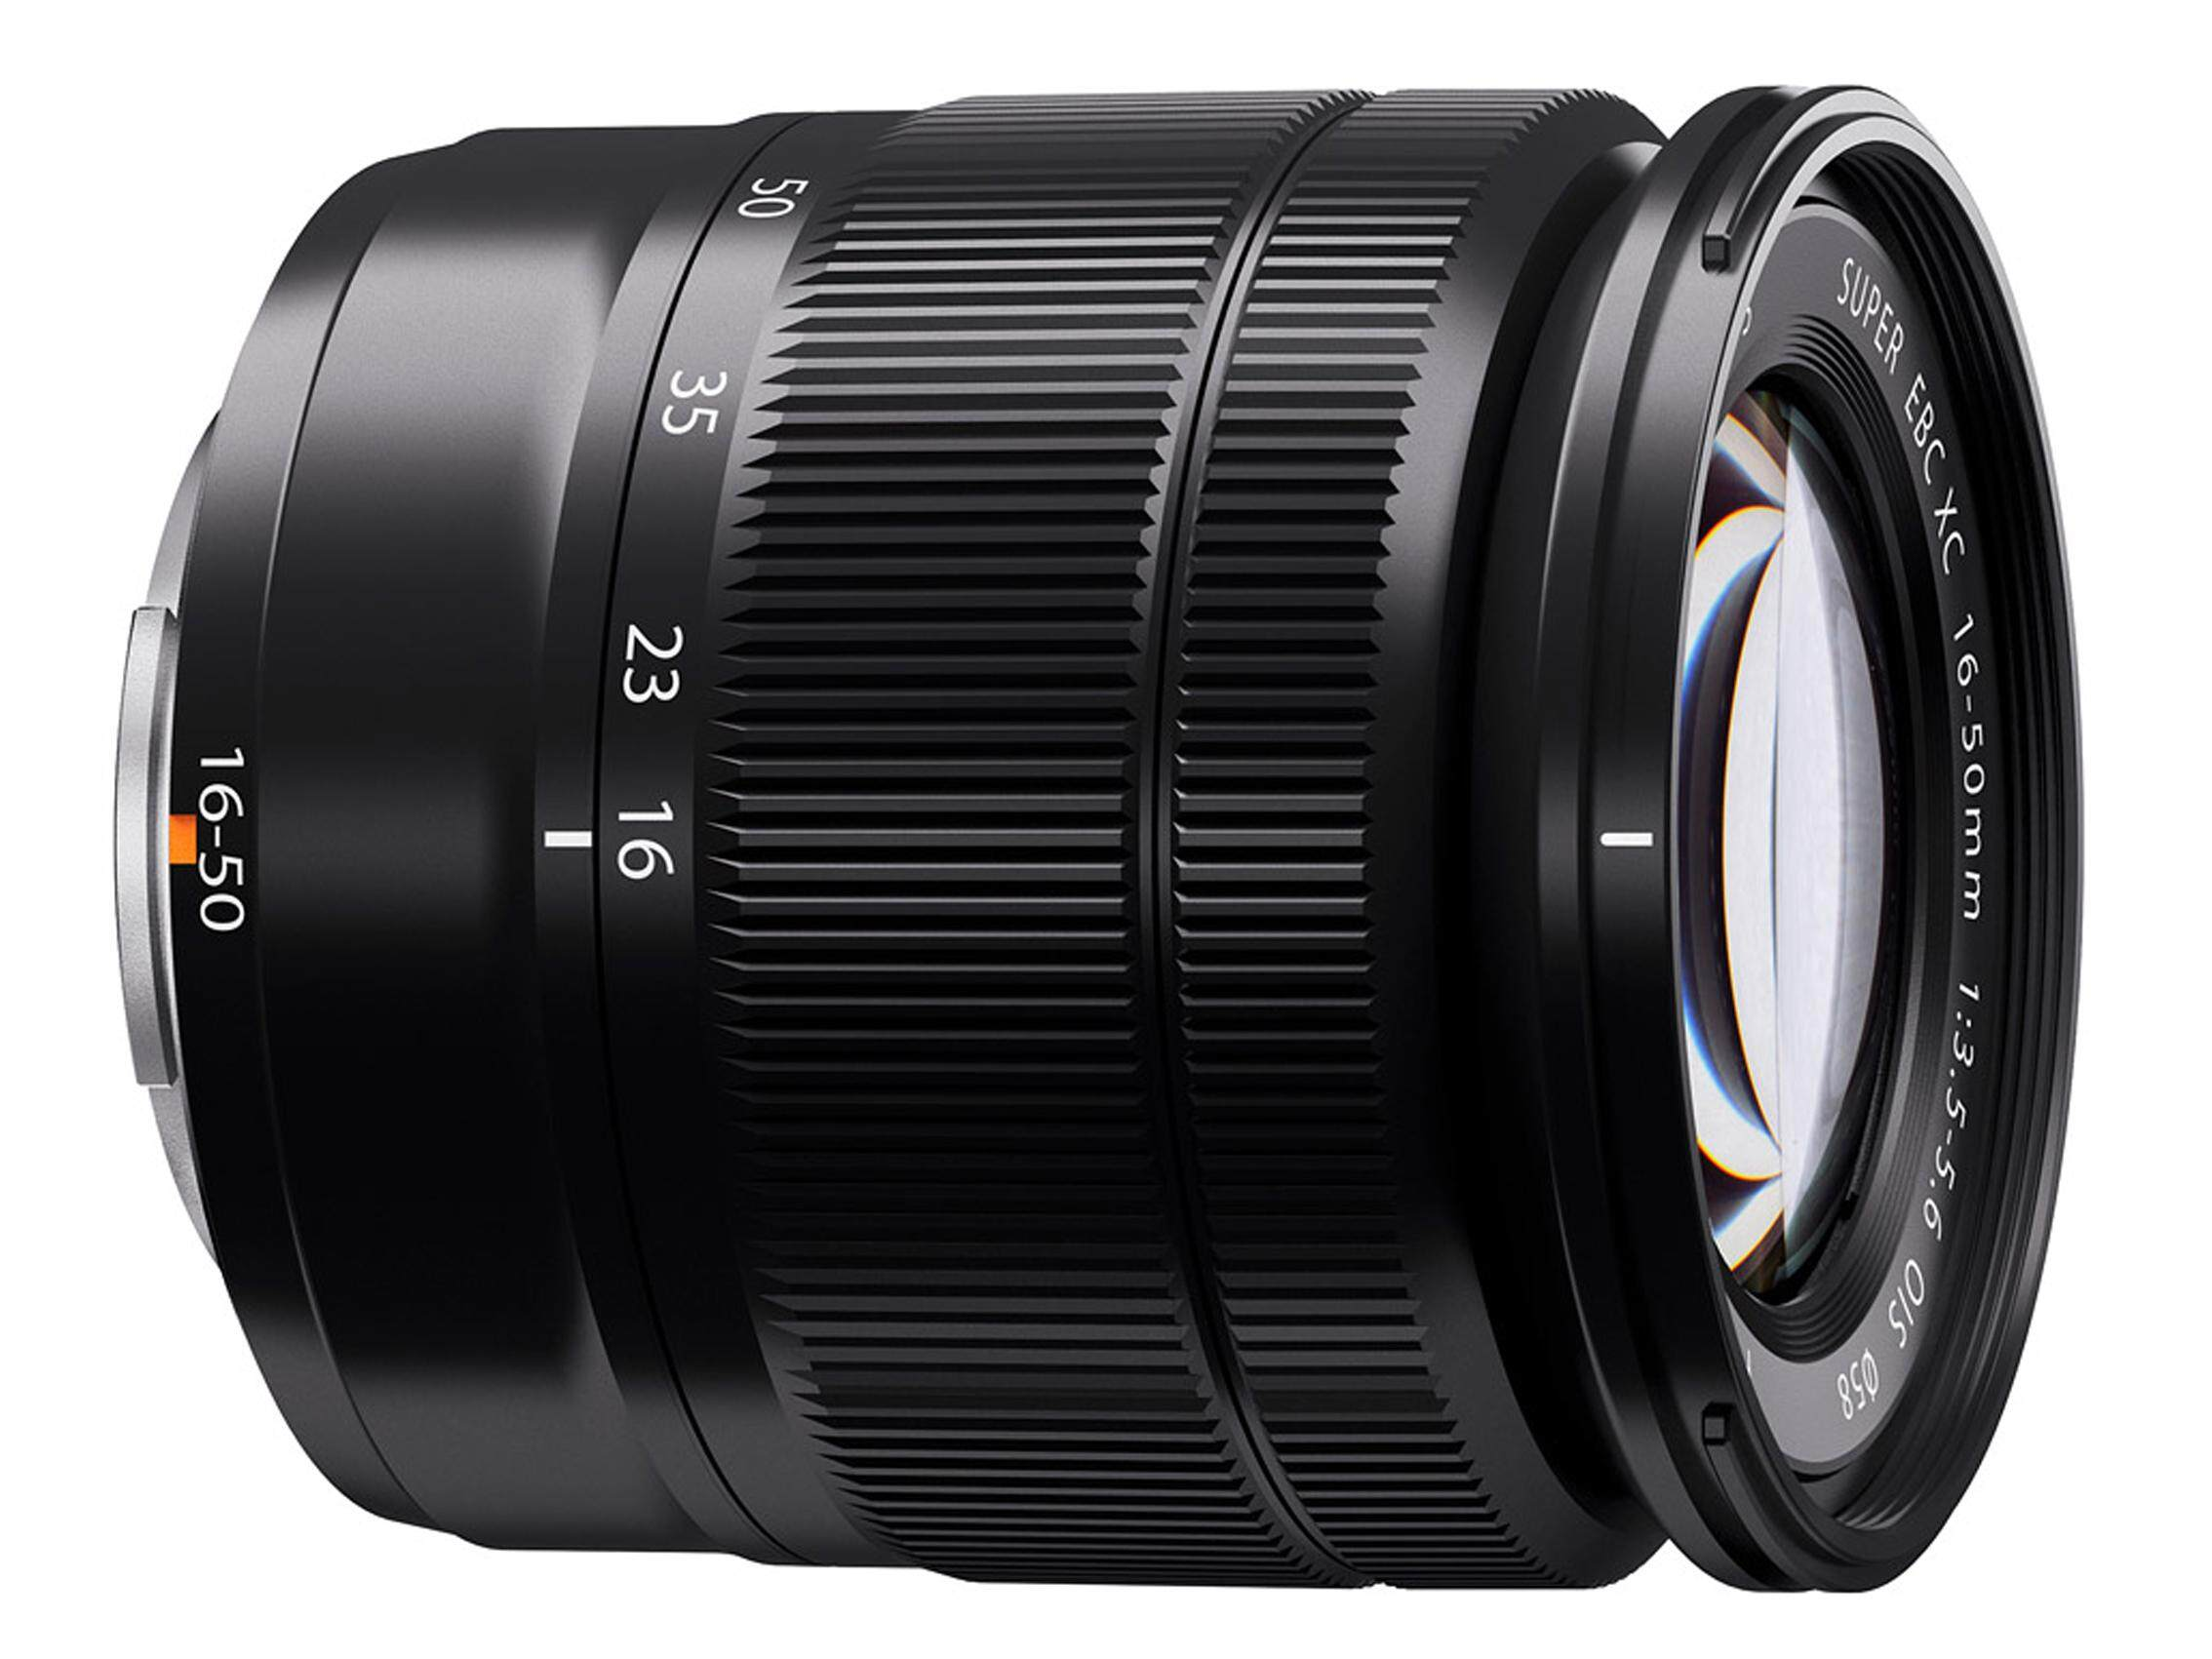 Fitur Fujifilm X A10 Kit 16 50mm F3 5 6 Ois Ii Mirrorless Pink A3 F35 56 Brown Xc F 35 Lens White Box